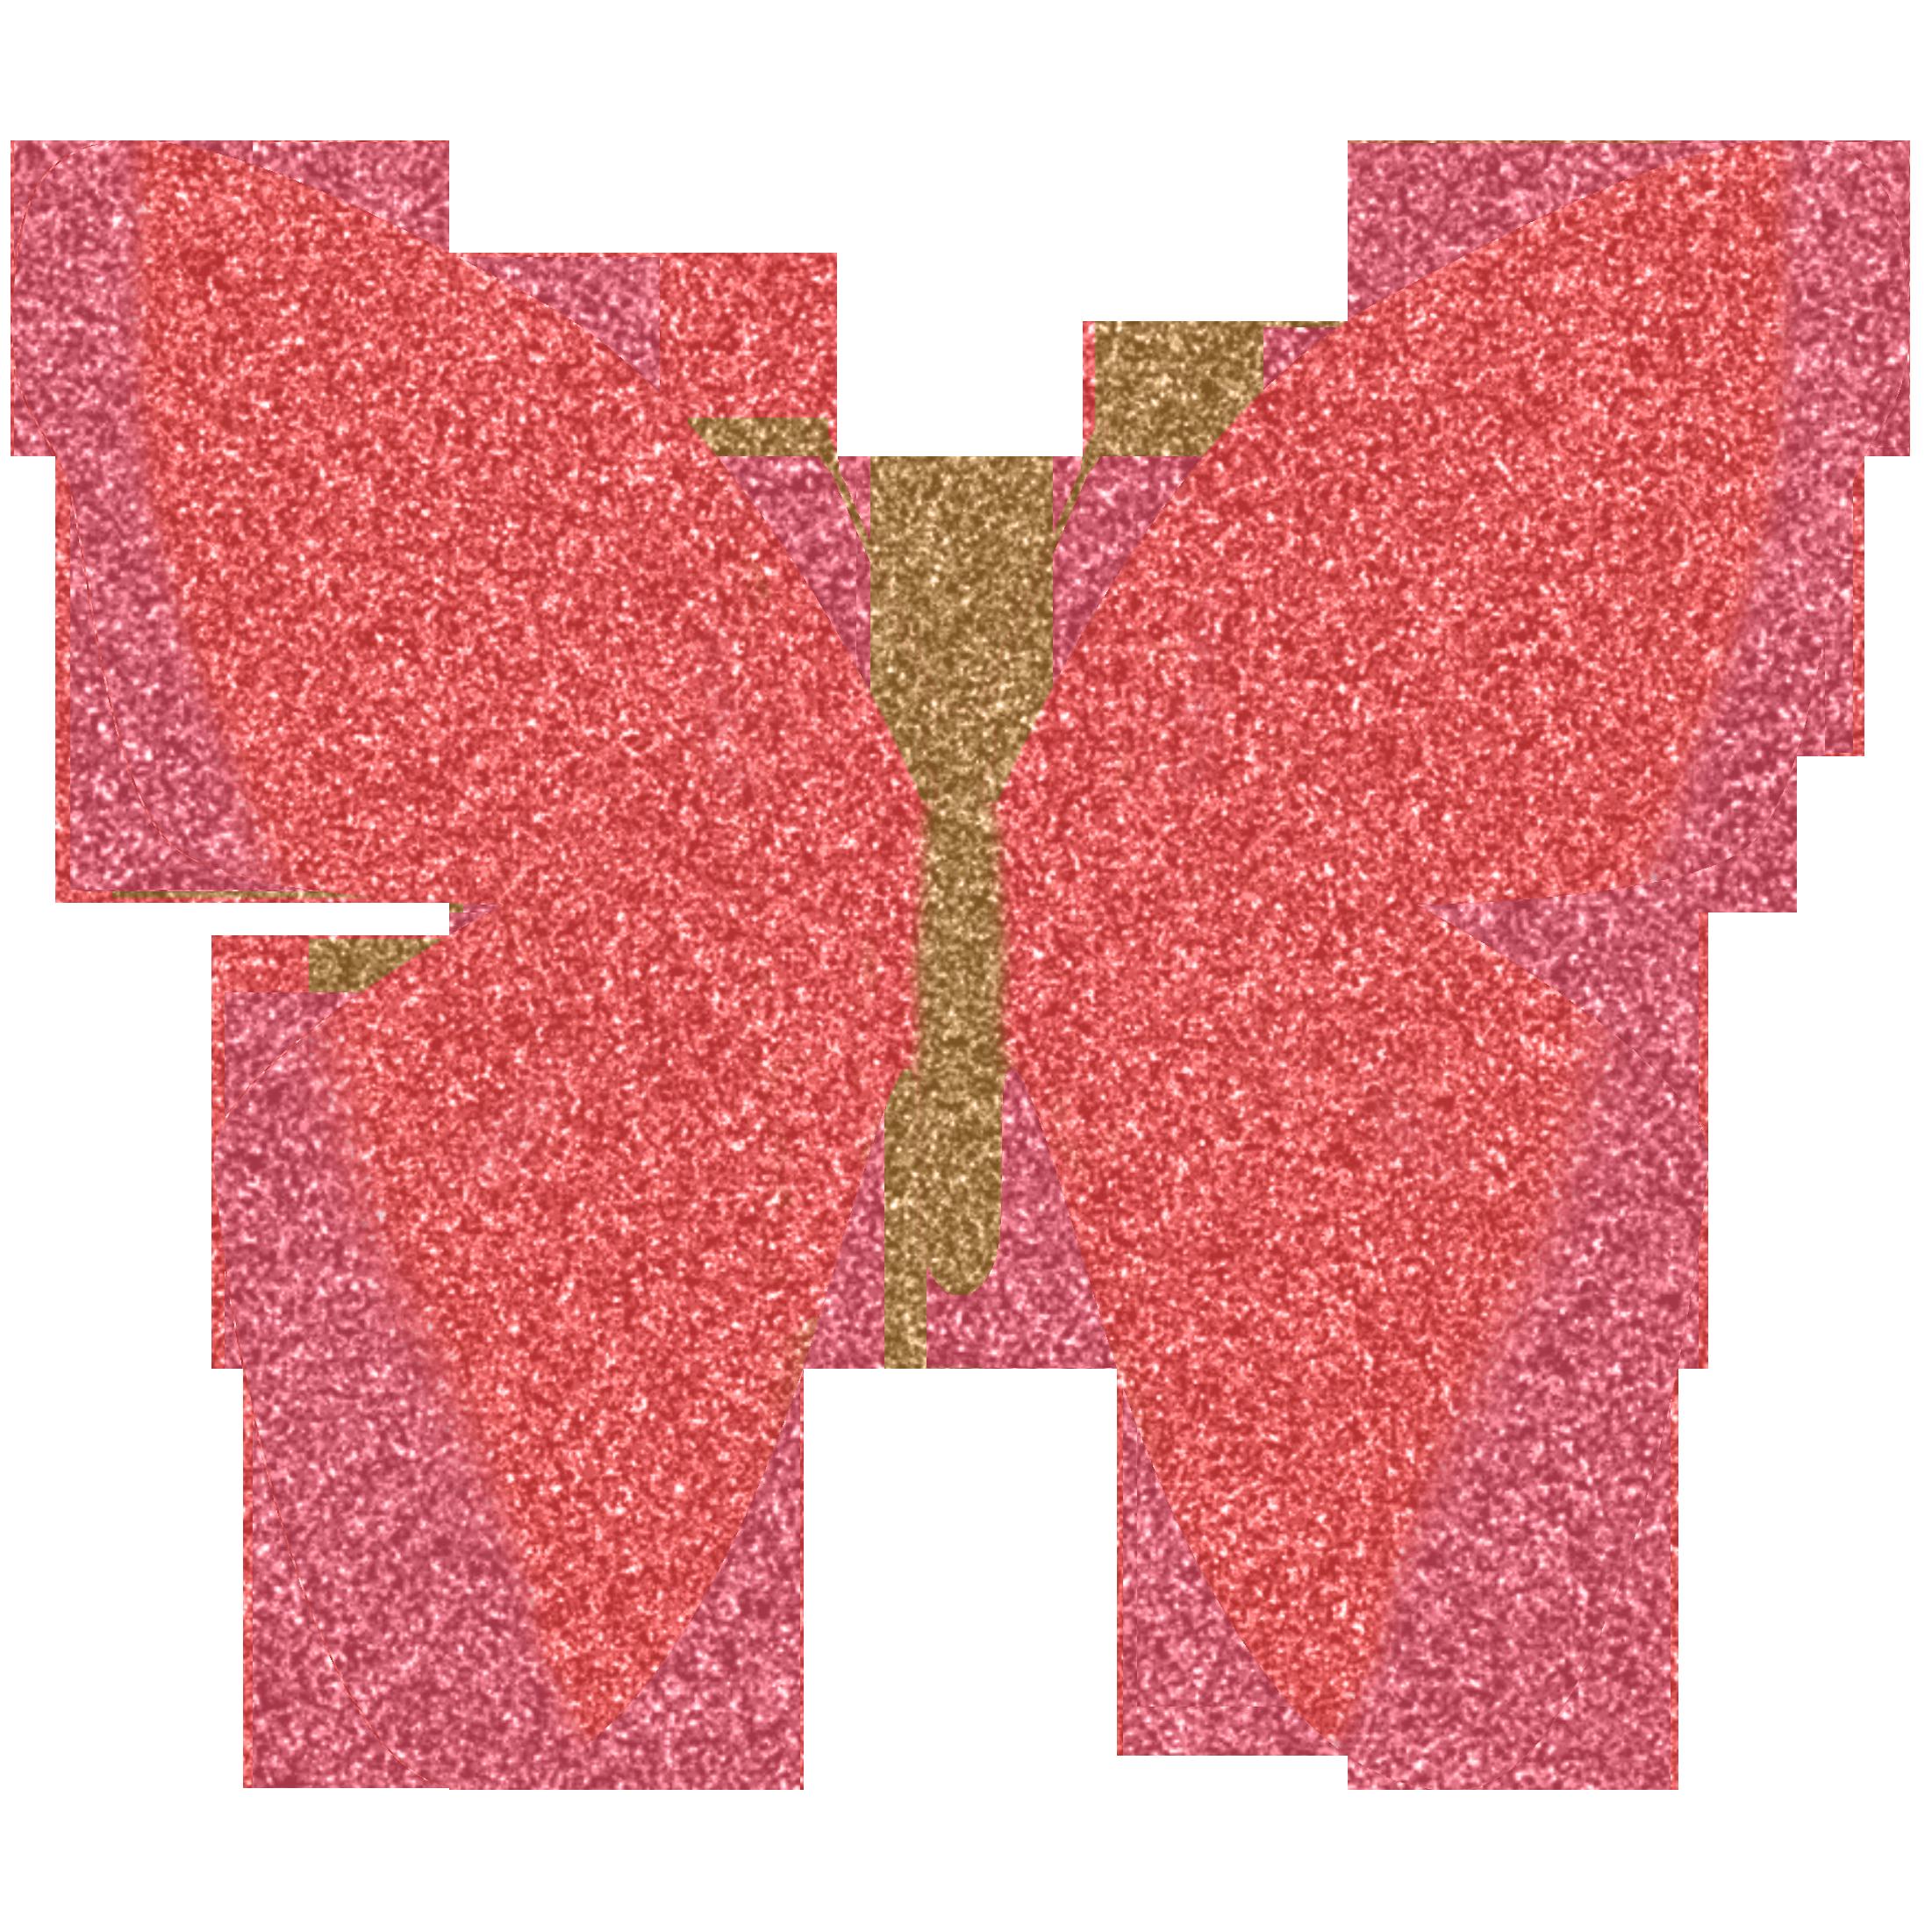 2202x2202 Free Glitter Butterfly Clipart Clipart Panda